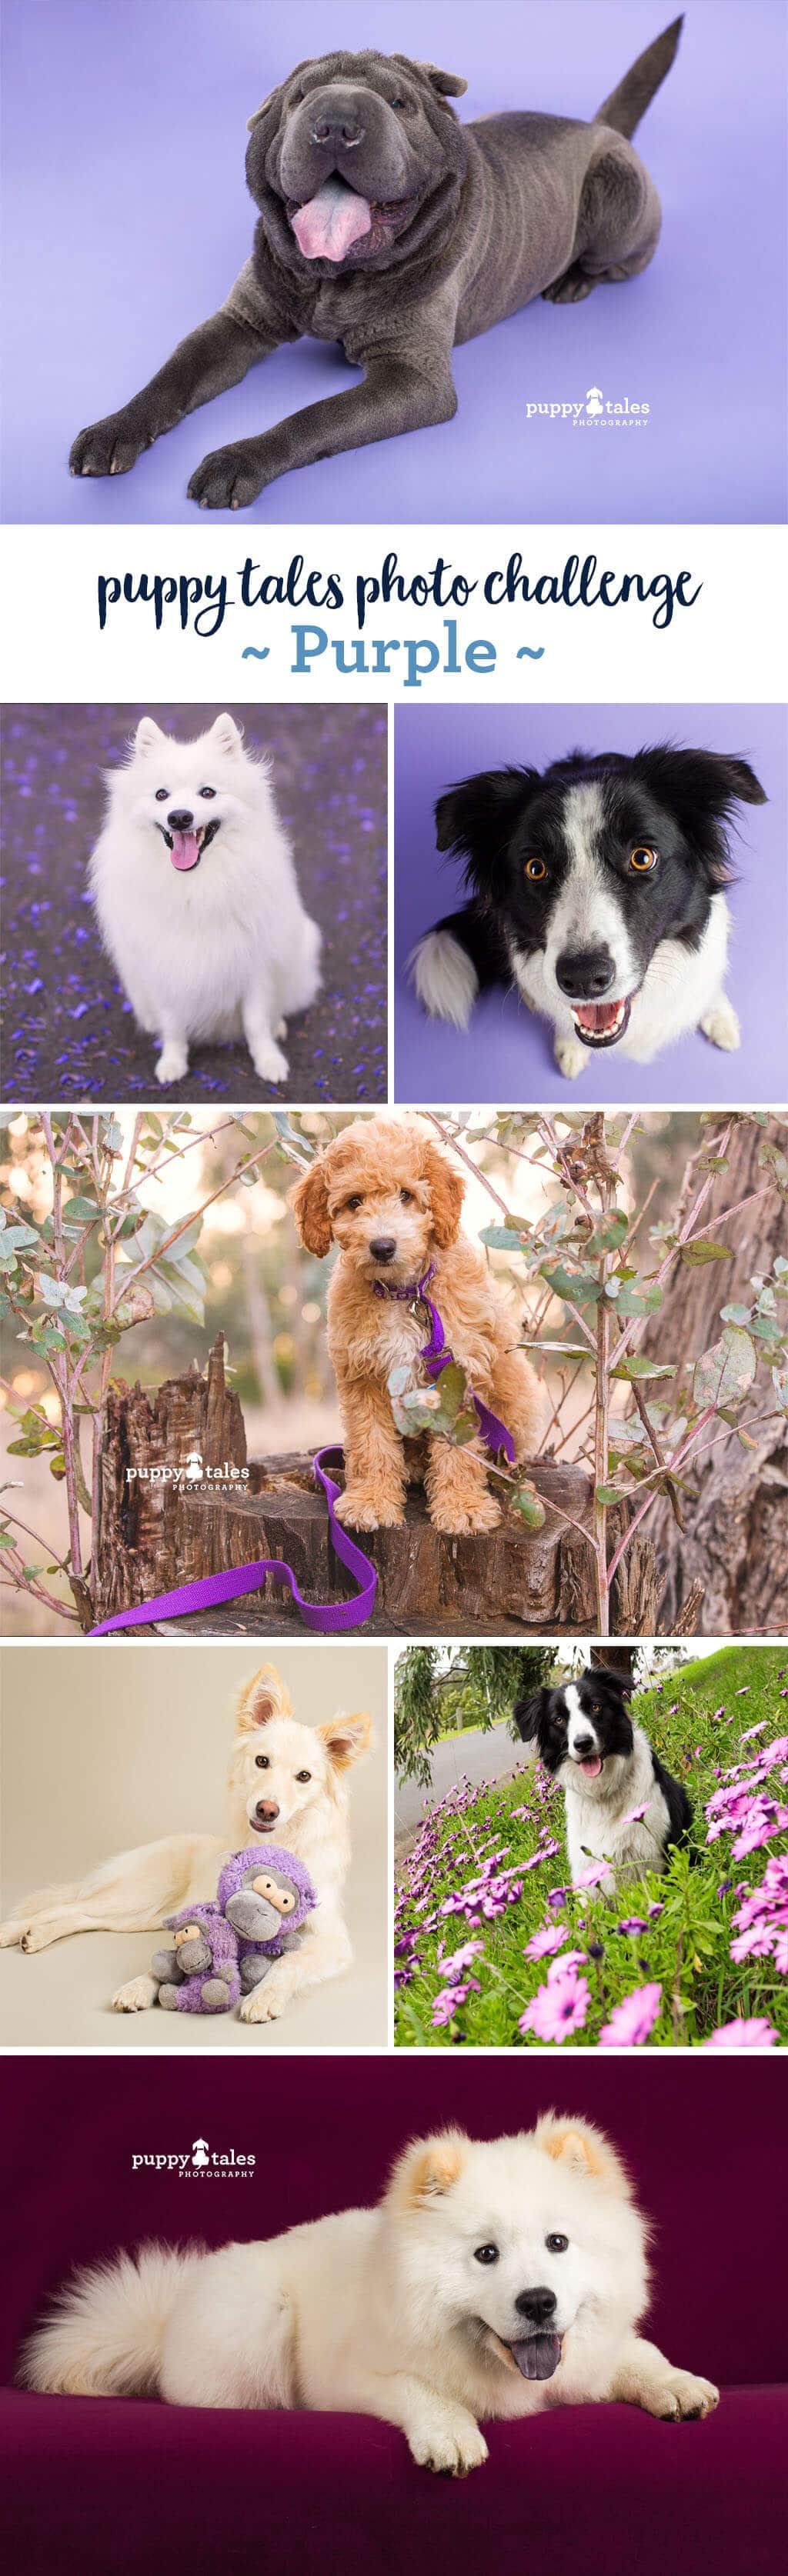 Puppy Tales Photo Challenge ~ Purple